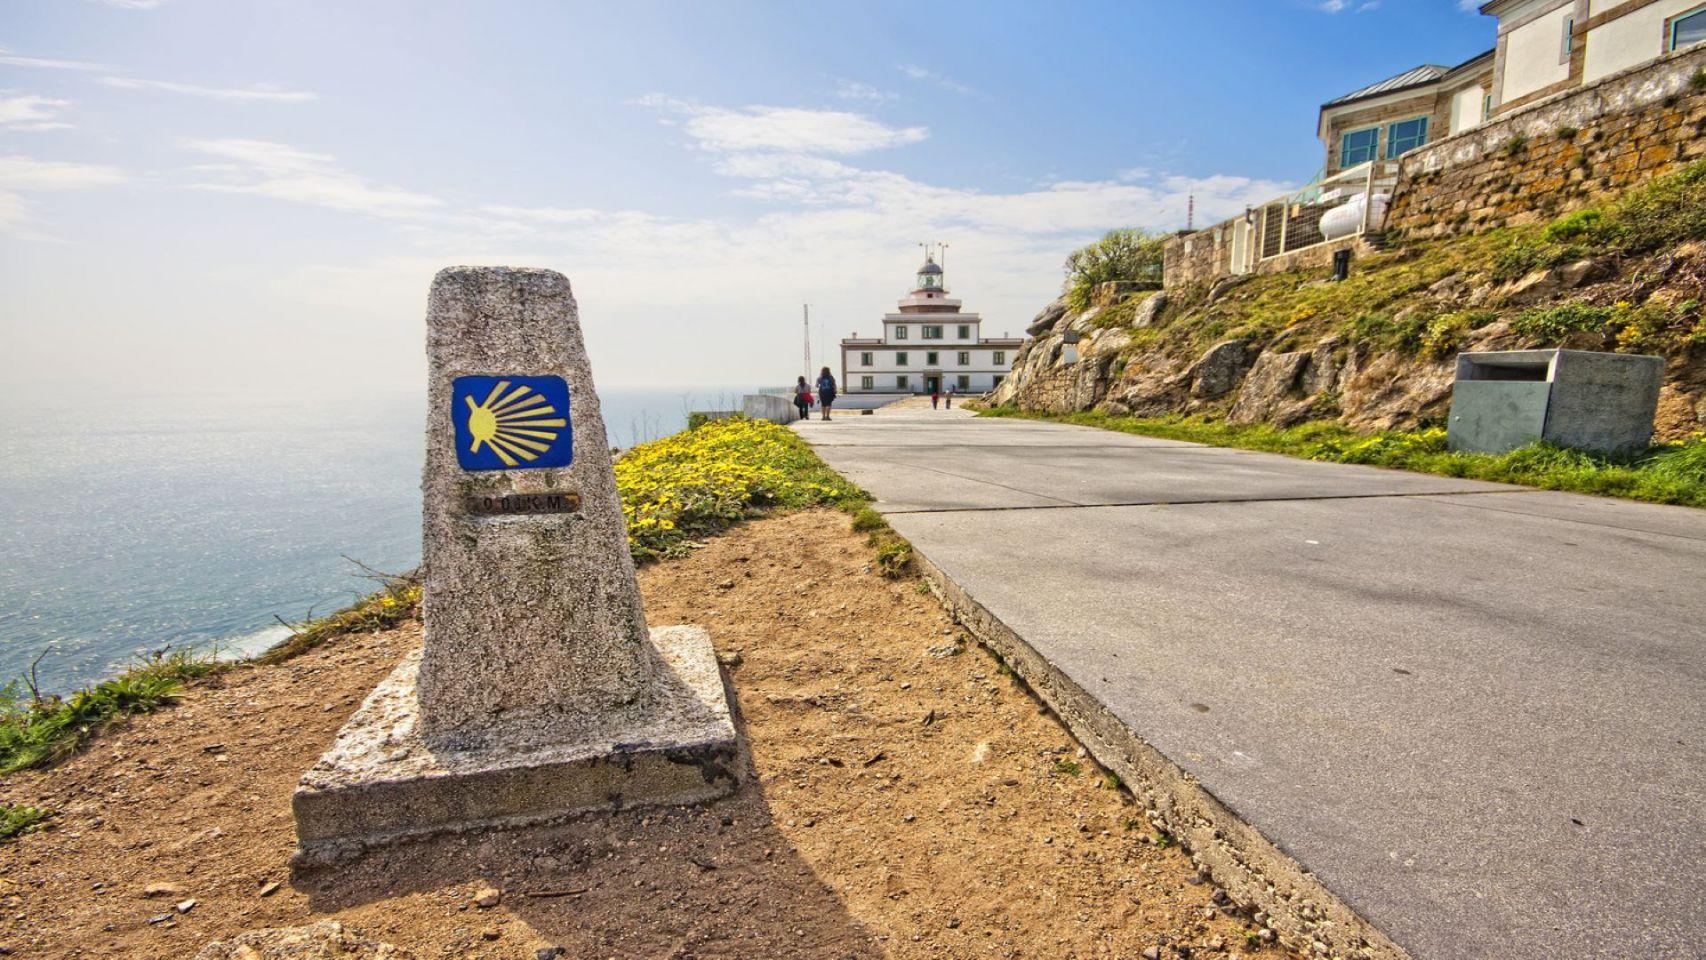 Faro de Fisterra - Camino de Fisterra - Muxía :: Guía del Camino de Santiago